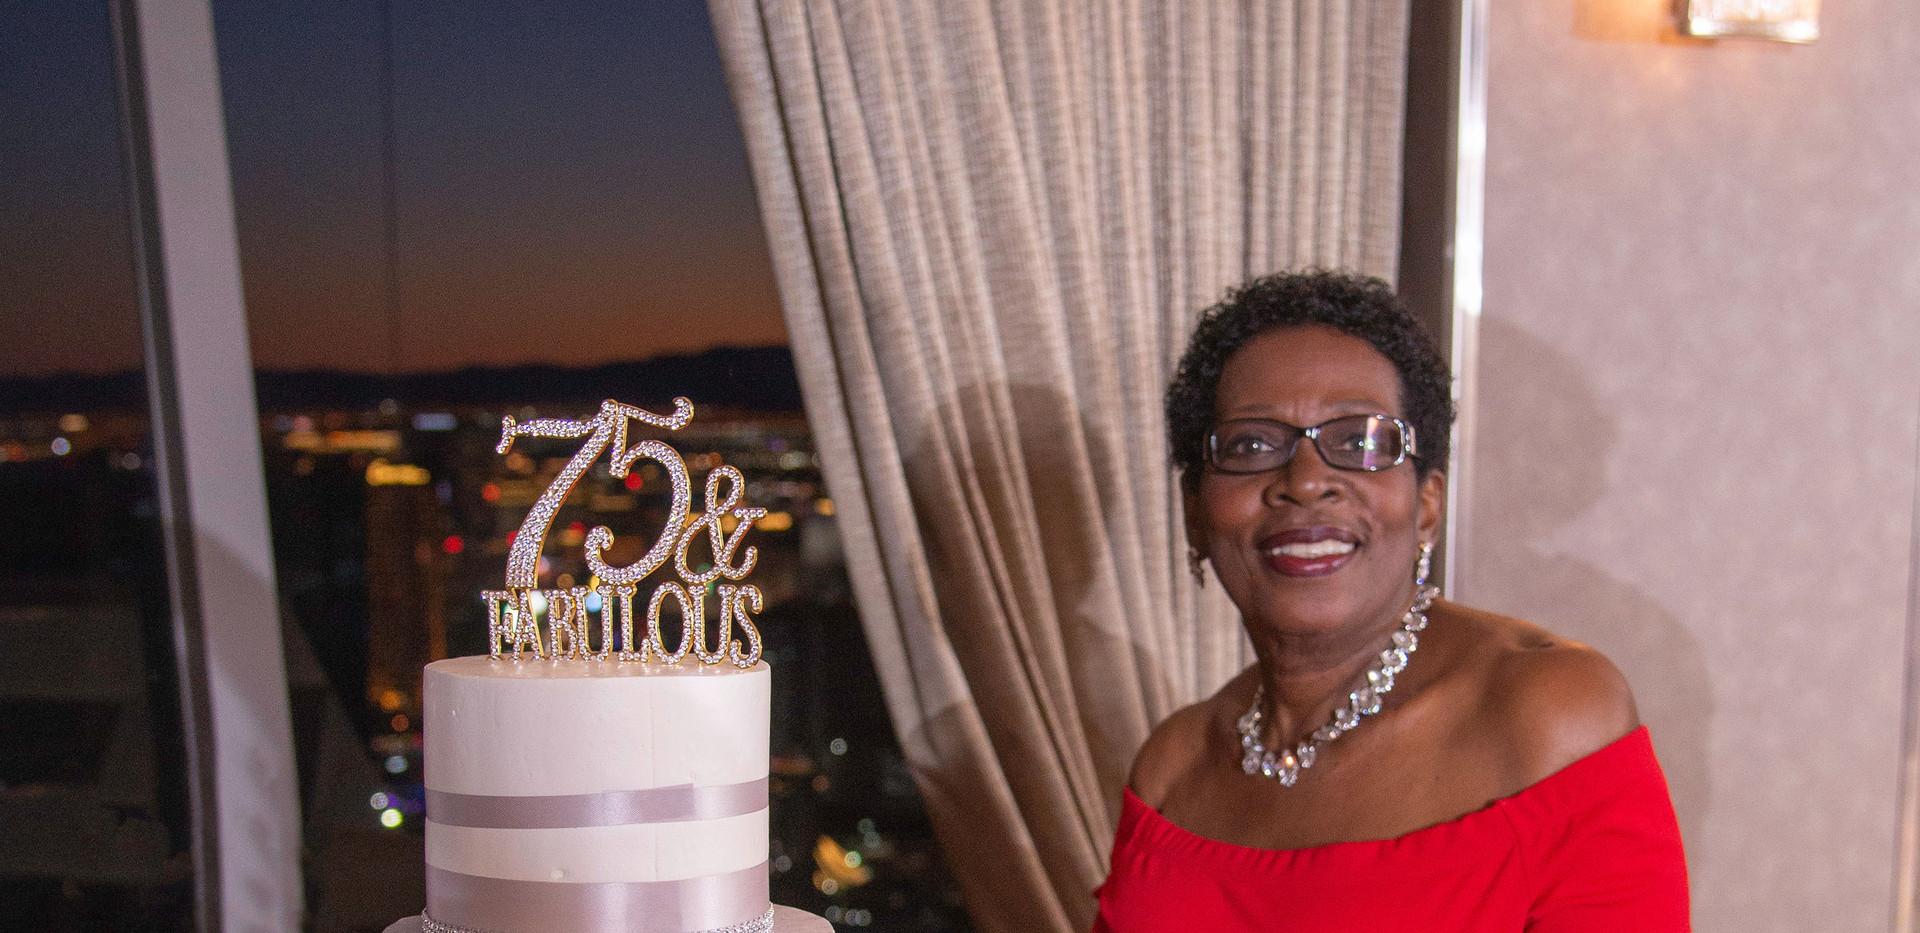 Cupcake Birthday display provided by Stratosphere Hotel in Las Vegas